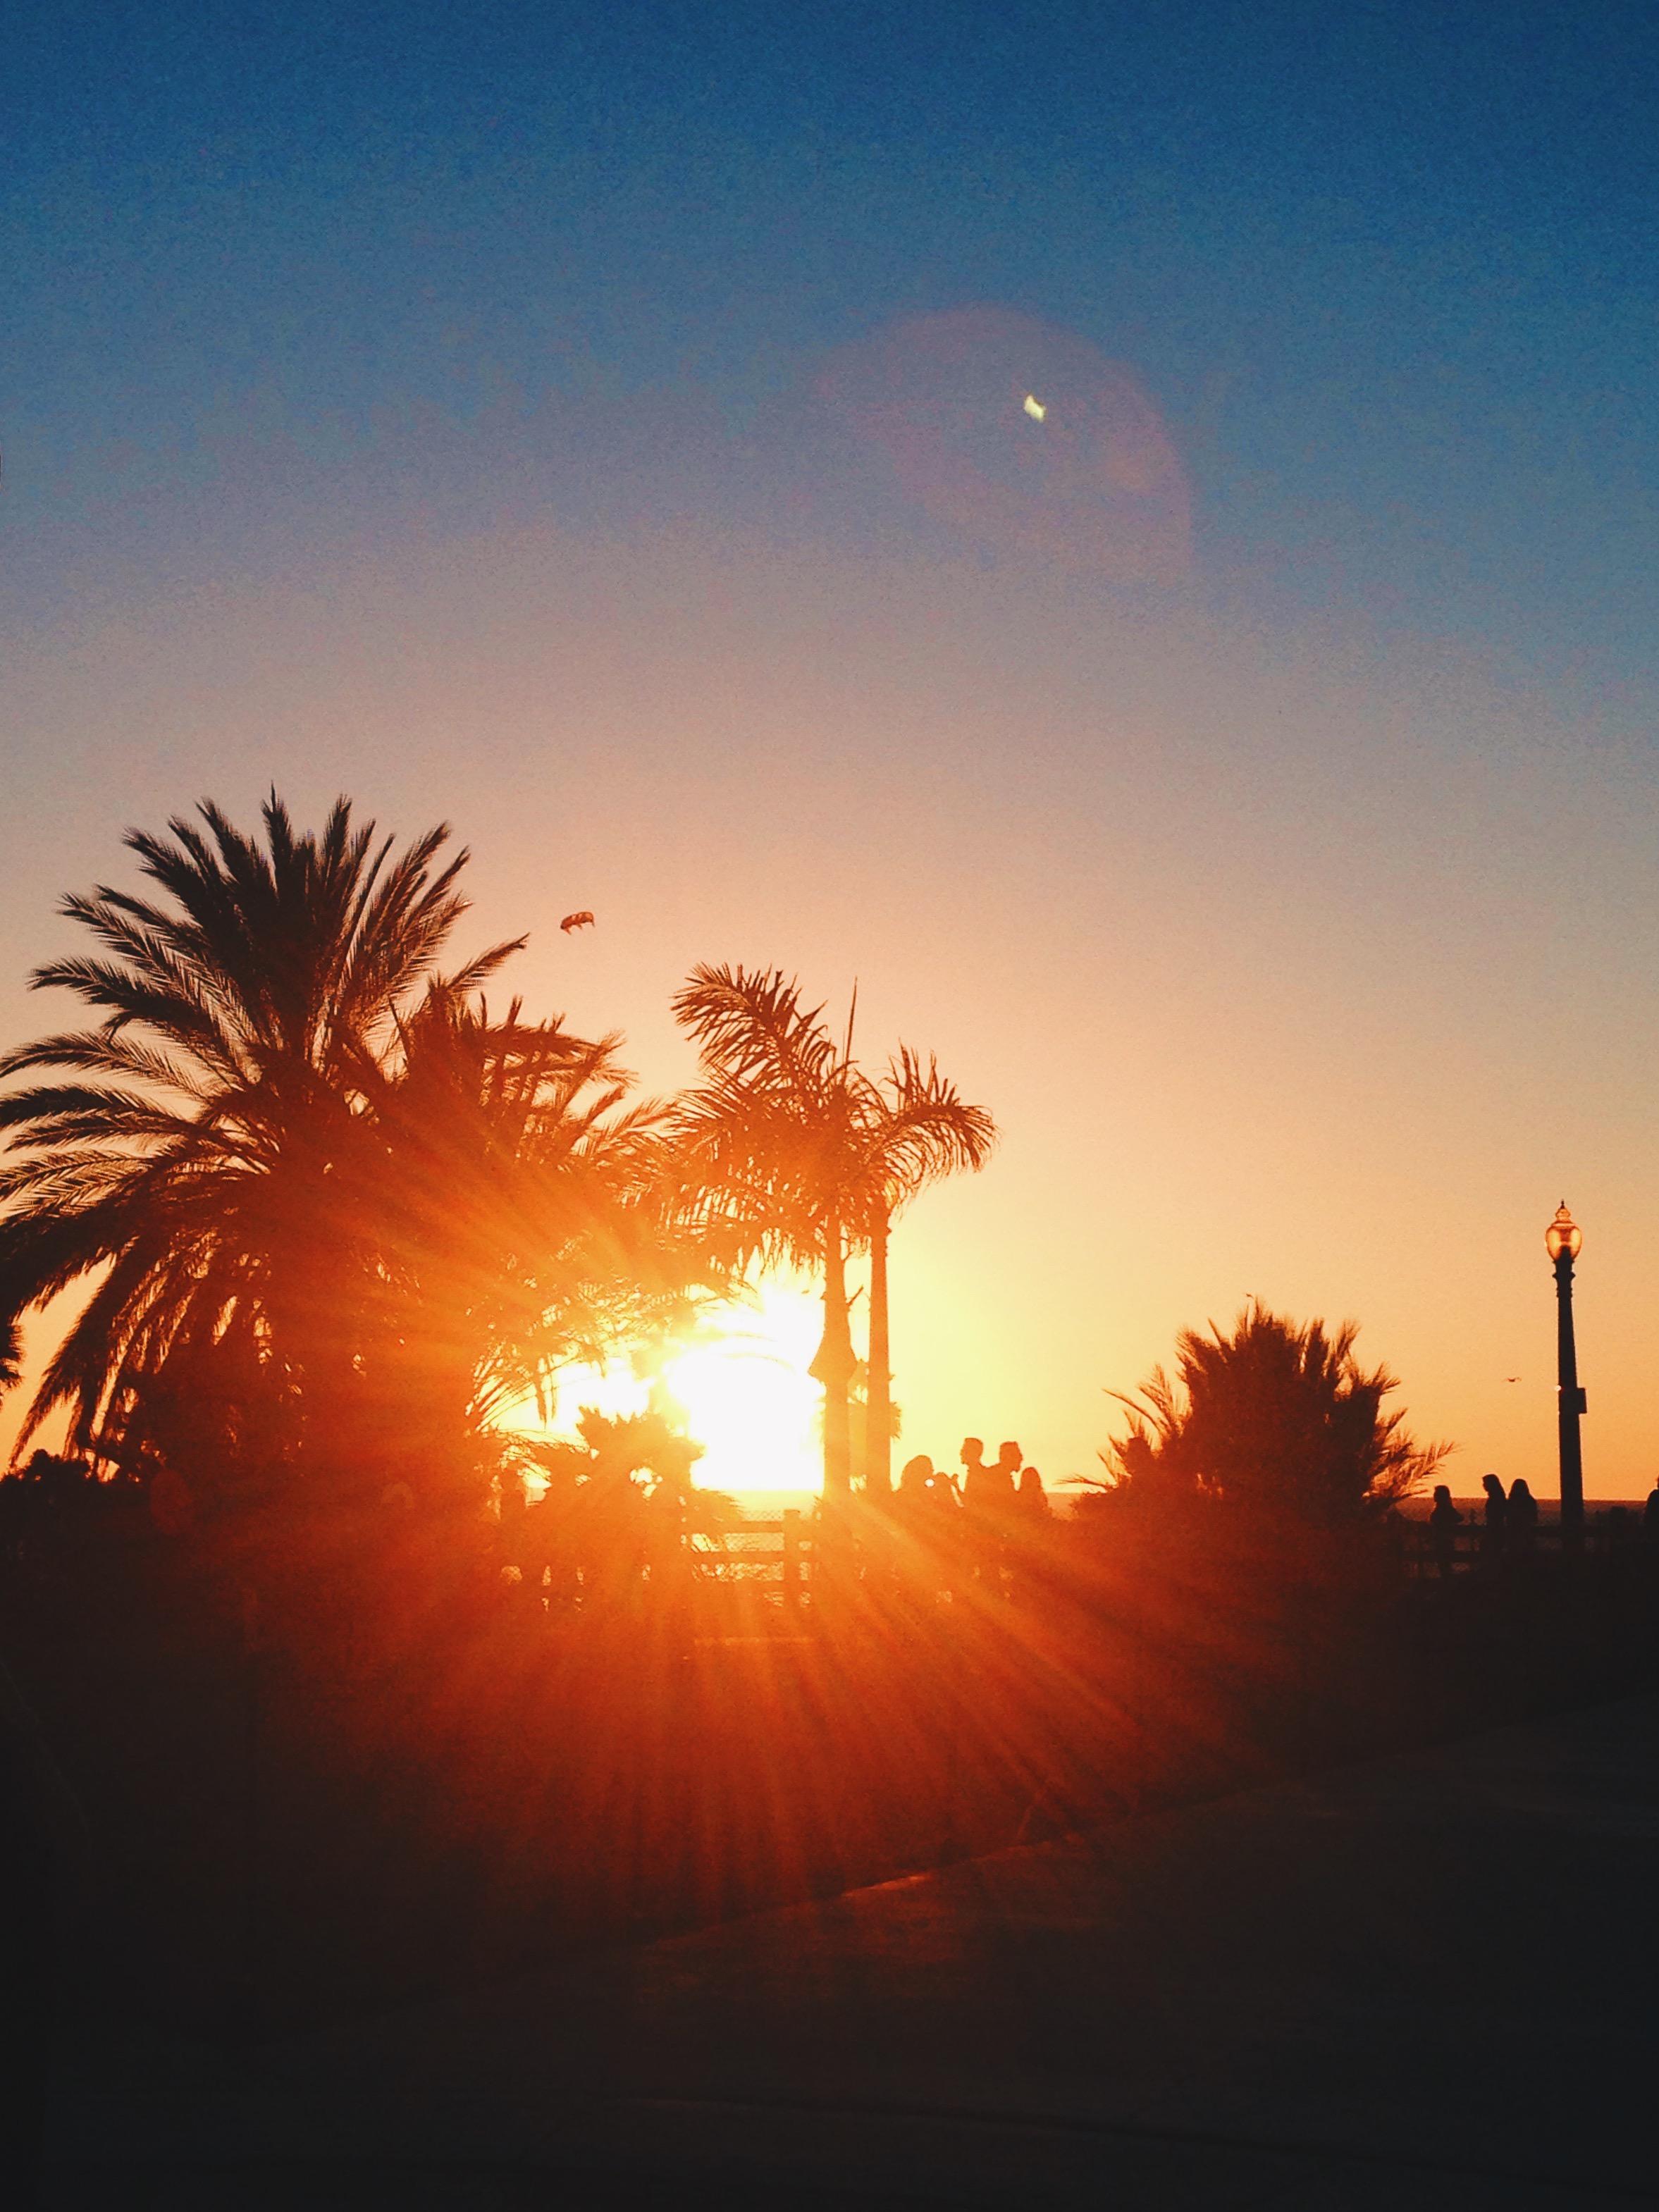 Los Angeles, California - Santa Monica Boulevard Sunset - illumelation